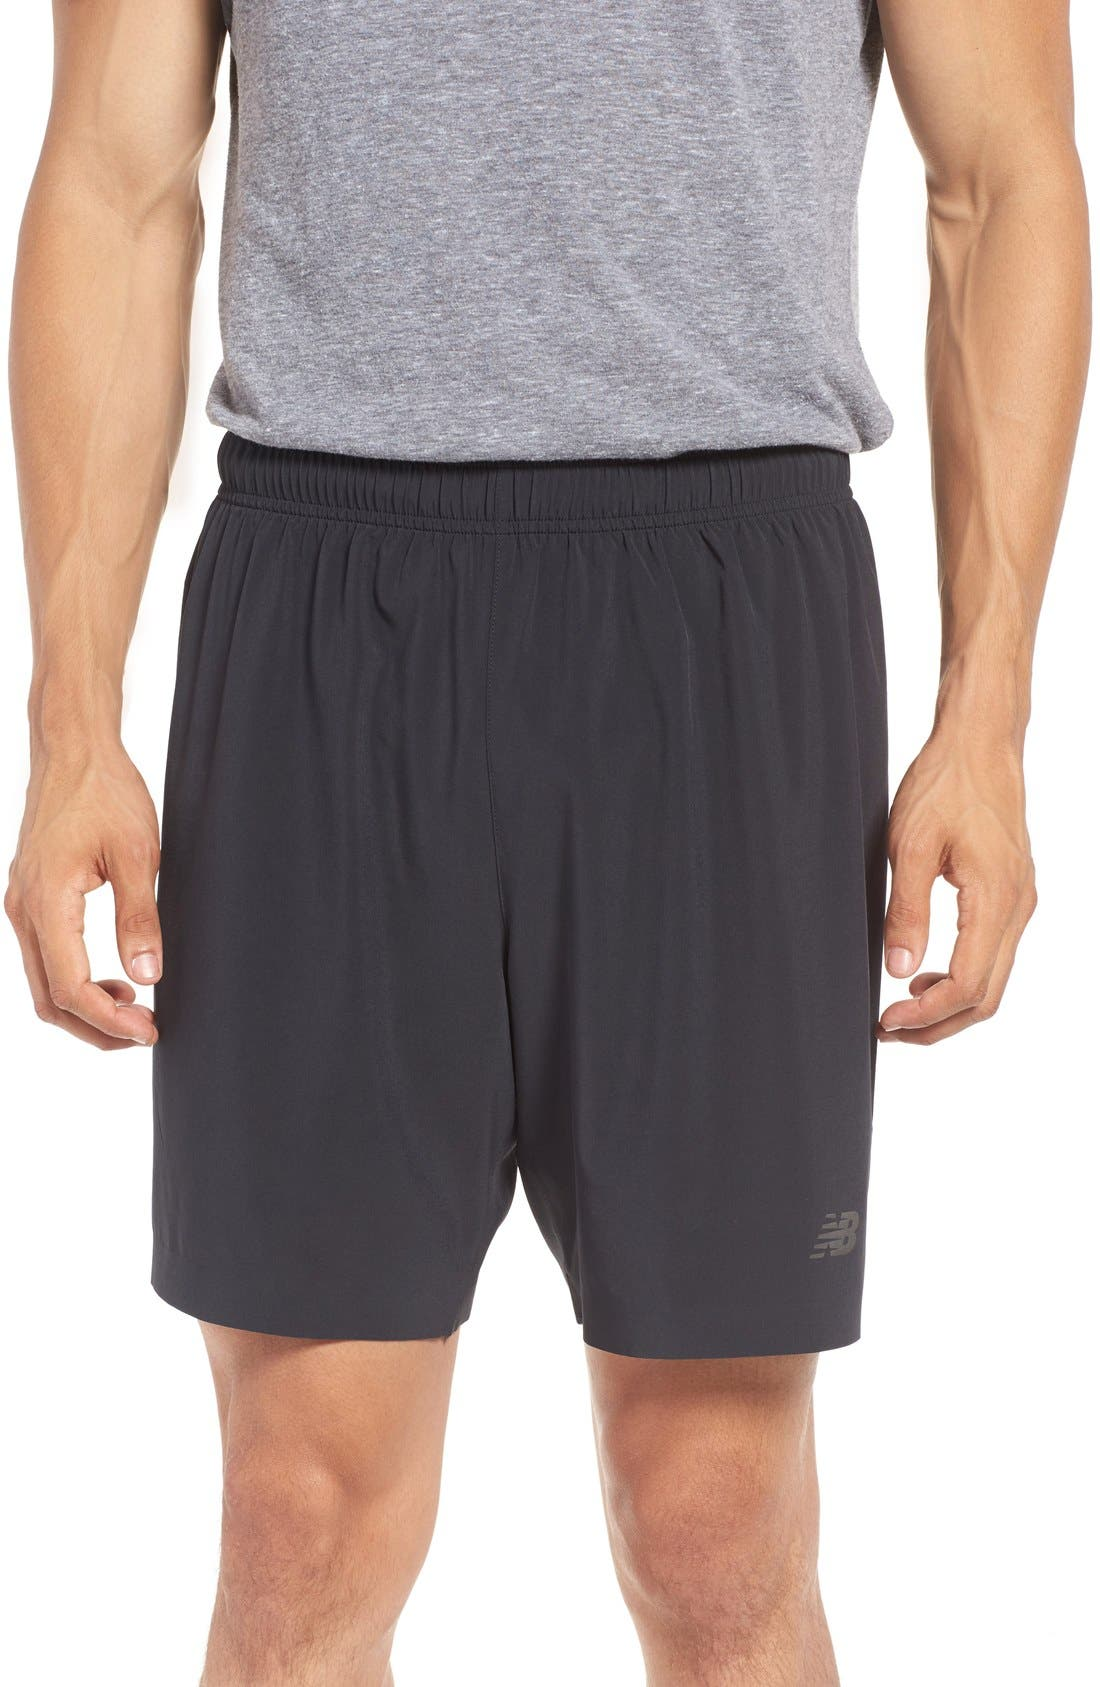 'Shift' Athletic Fit Training Shorts,                             Alternate thumbnail 5, color,                             001